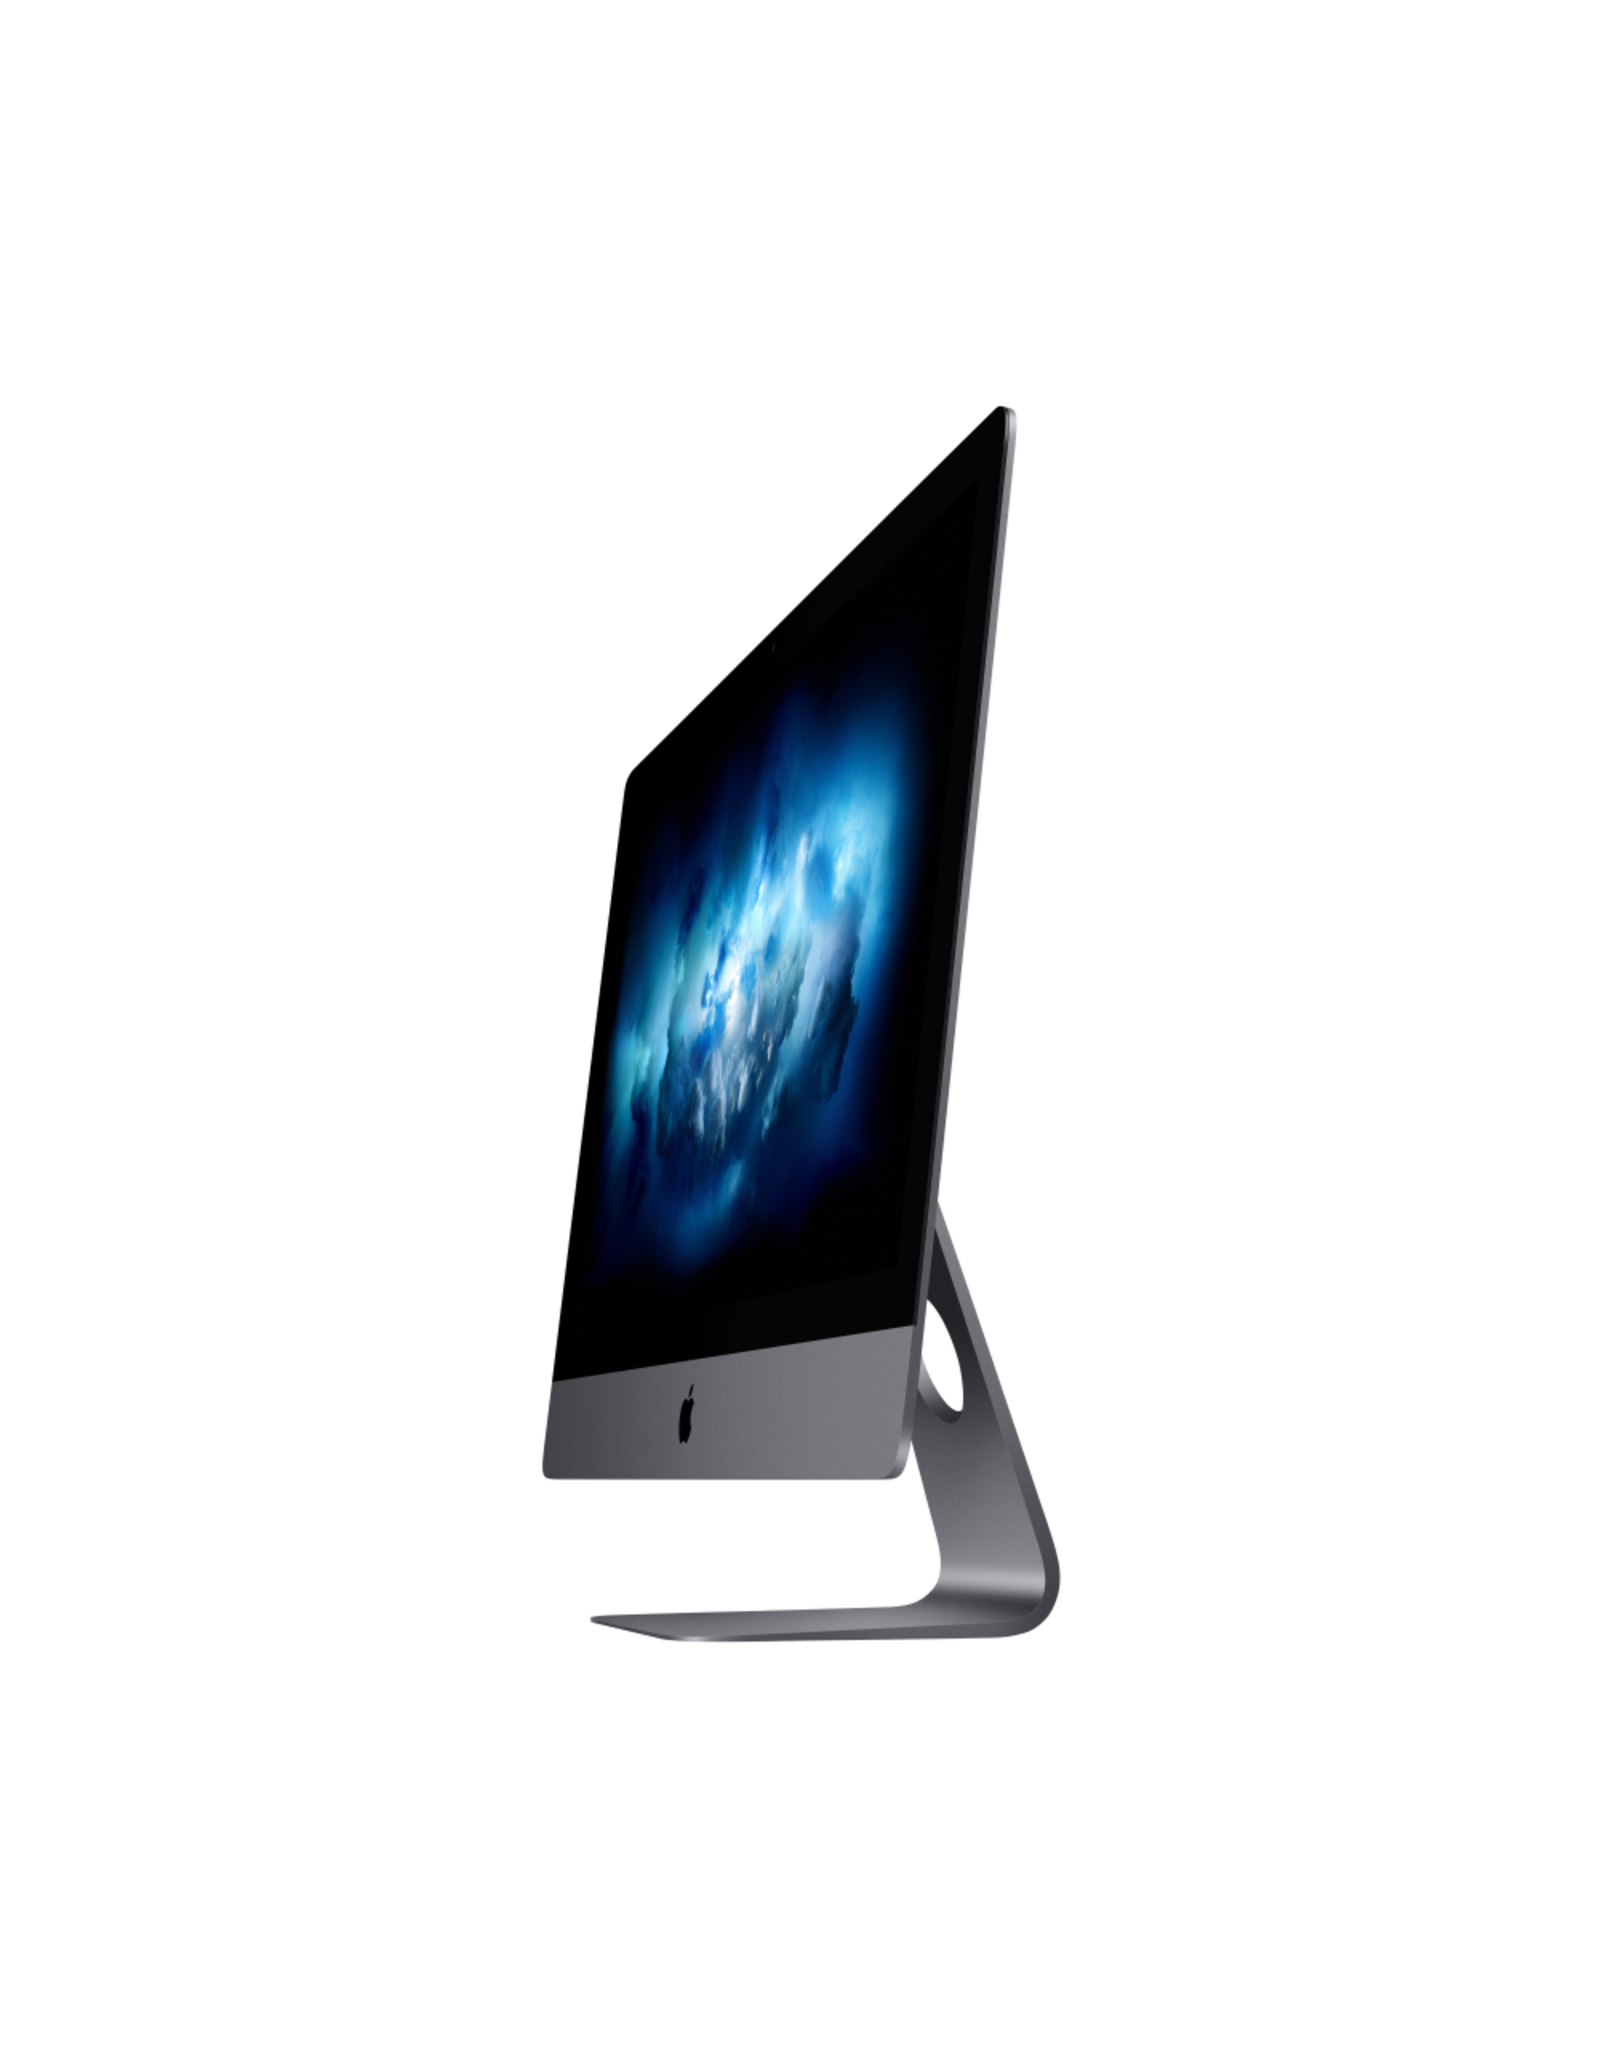 Apple 27-inch iMac Pro  Retina 5K 3.0GHz 10-core Intel Xeon W/32GB /1TB SSD/Radeon Pro Vega 56 8GB